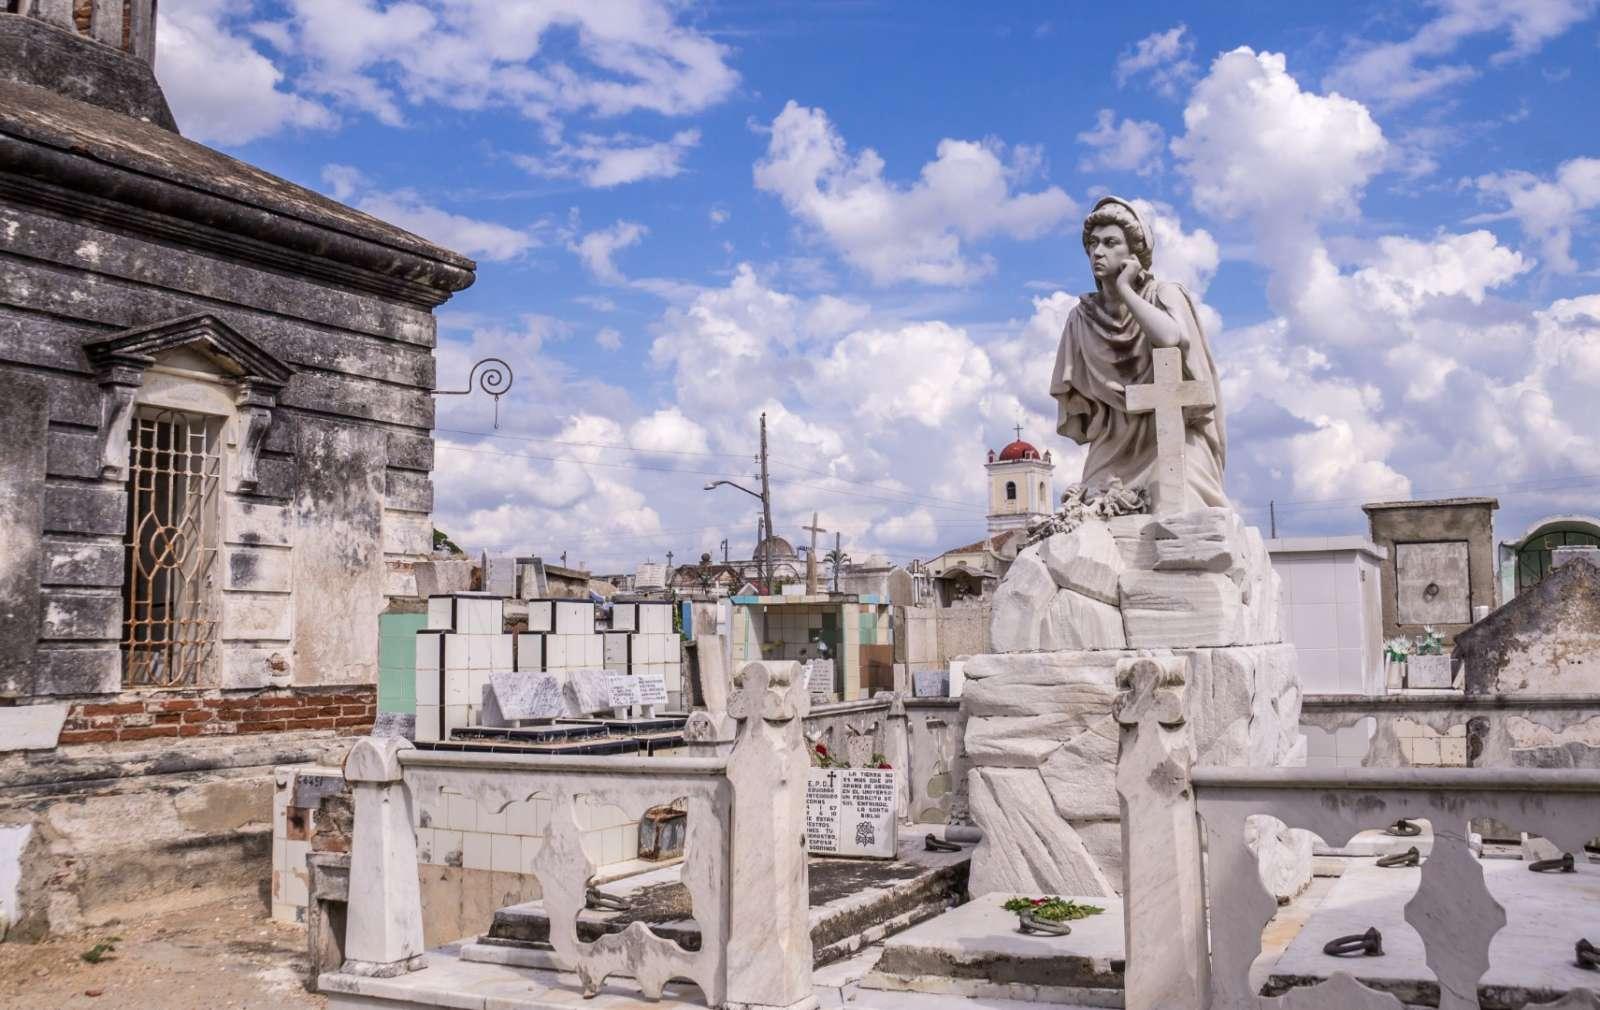 The cemetery in Camaguey, Cuba